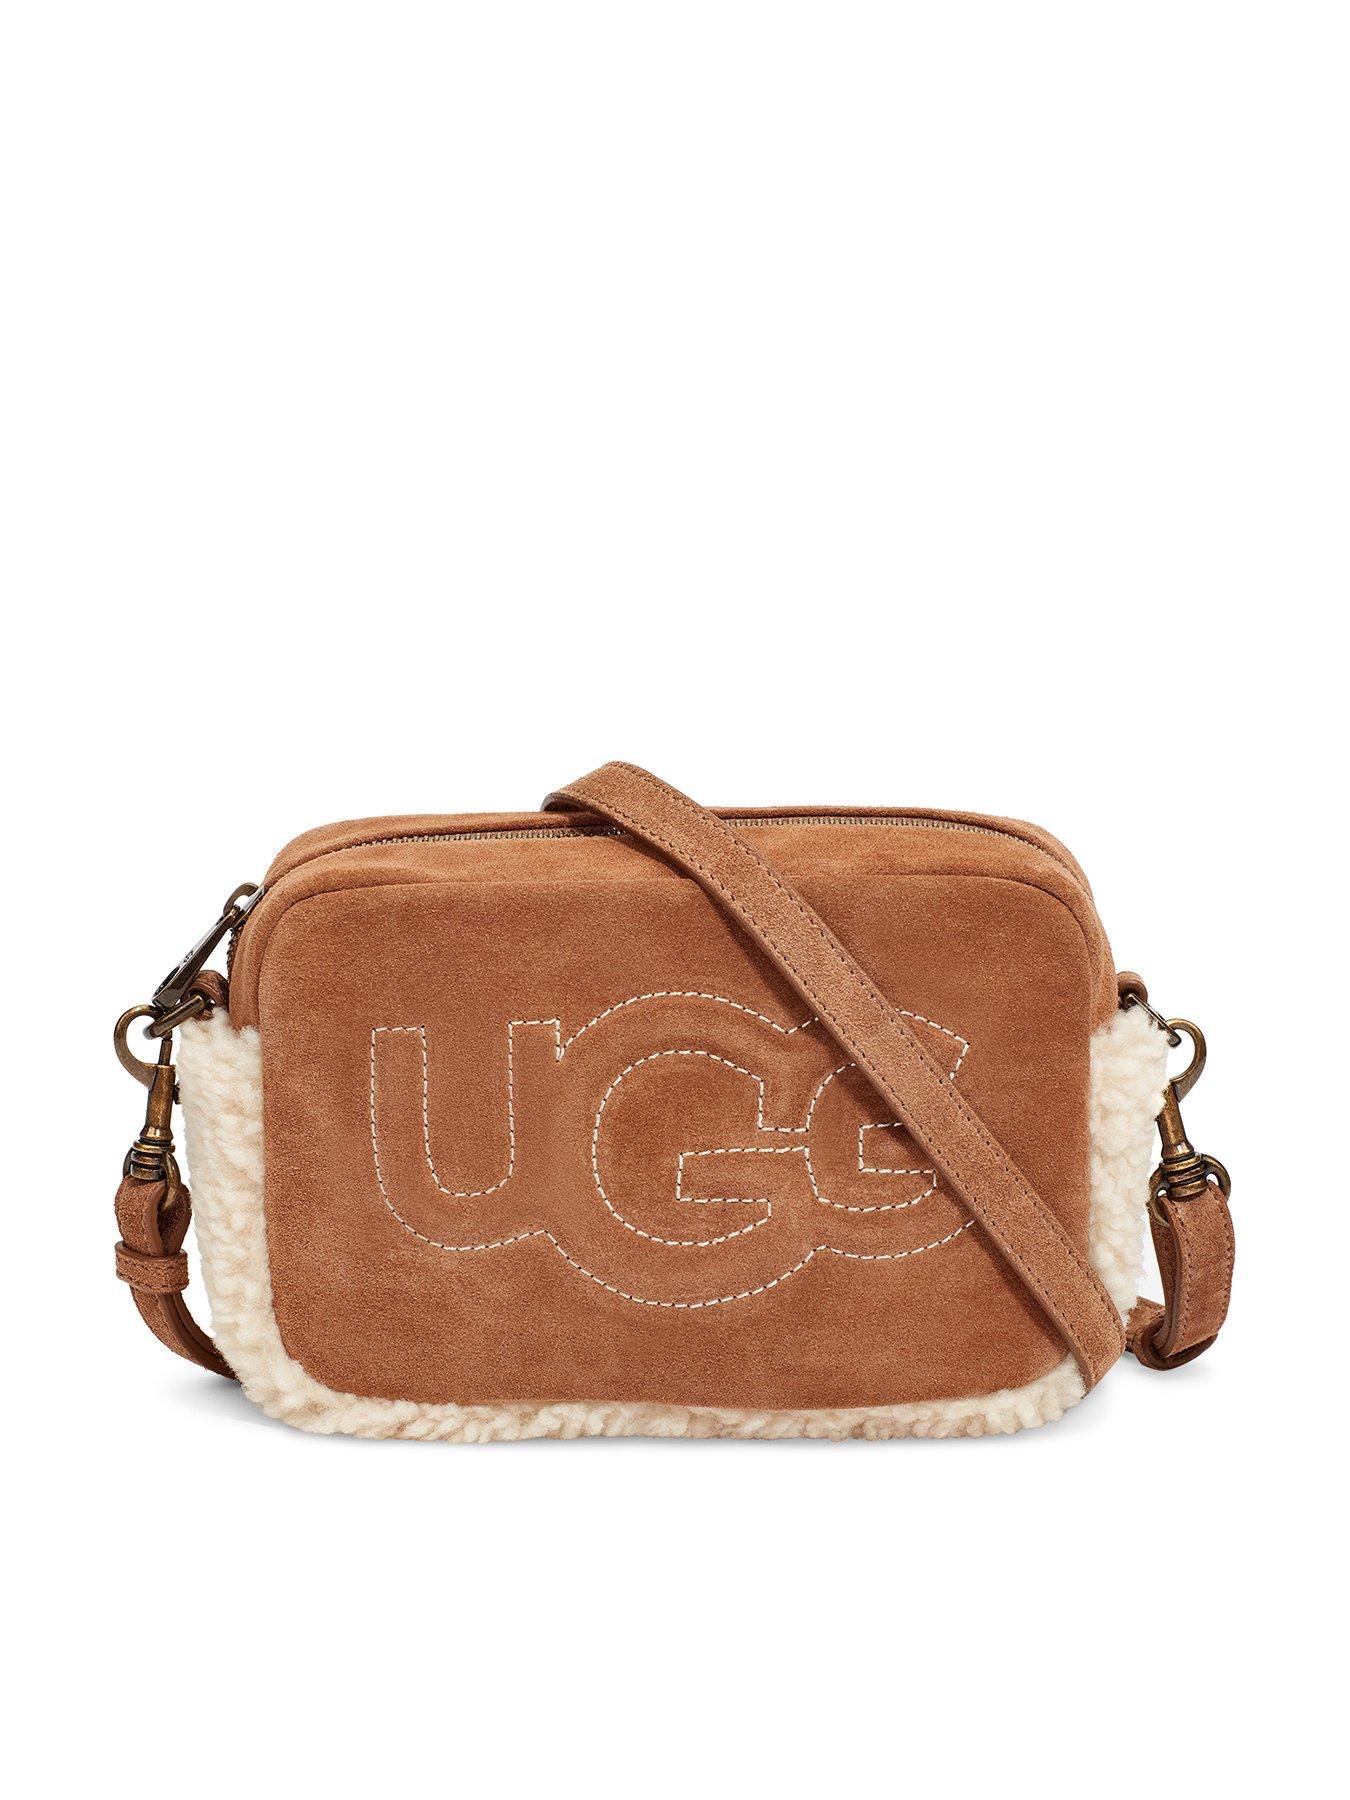 UGG Janey II Crossbody Bag - Chestnut